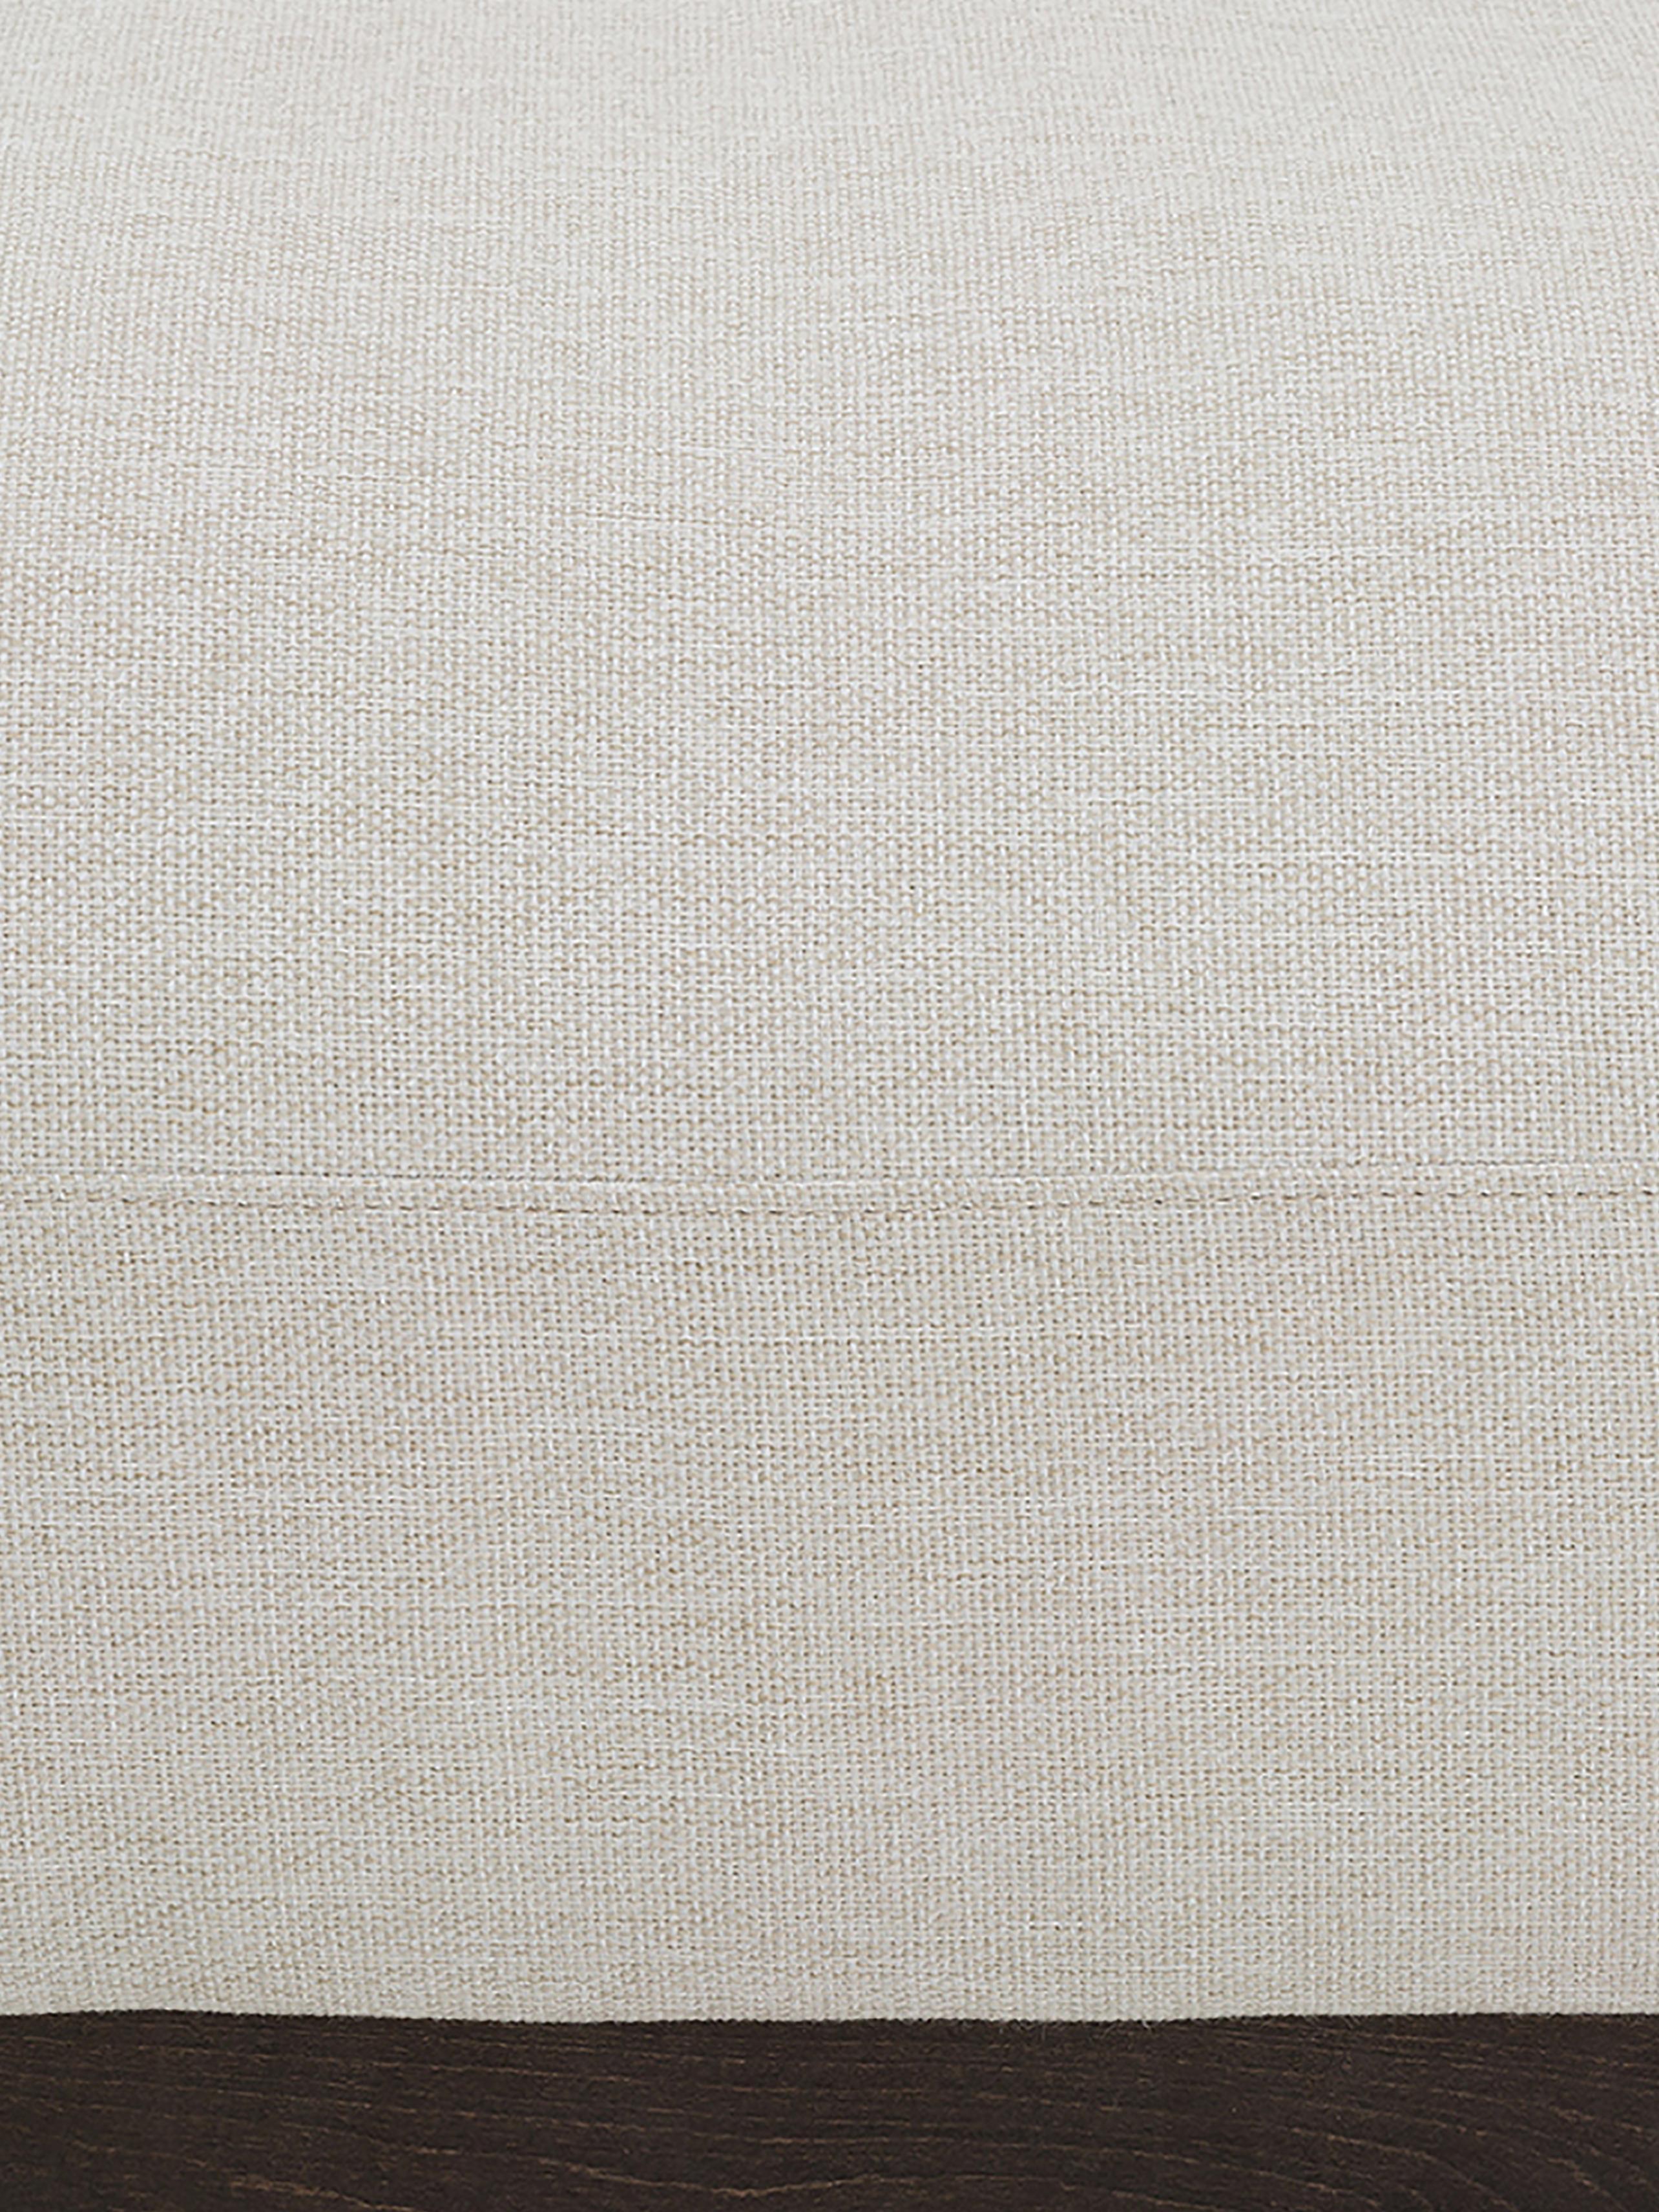 Sofá Brooks (3plazas), Tapizado: poliéster 35.000ciclos e, Estructura: madera de pino maciza, Patas: metal con pintura en polv, Correa: cuero genuino, Tejido beige, An 230 x F 98 cm